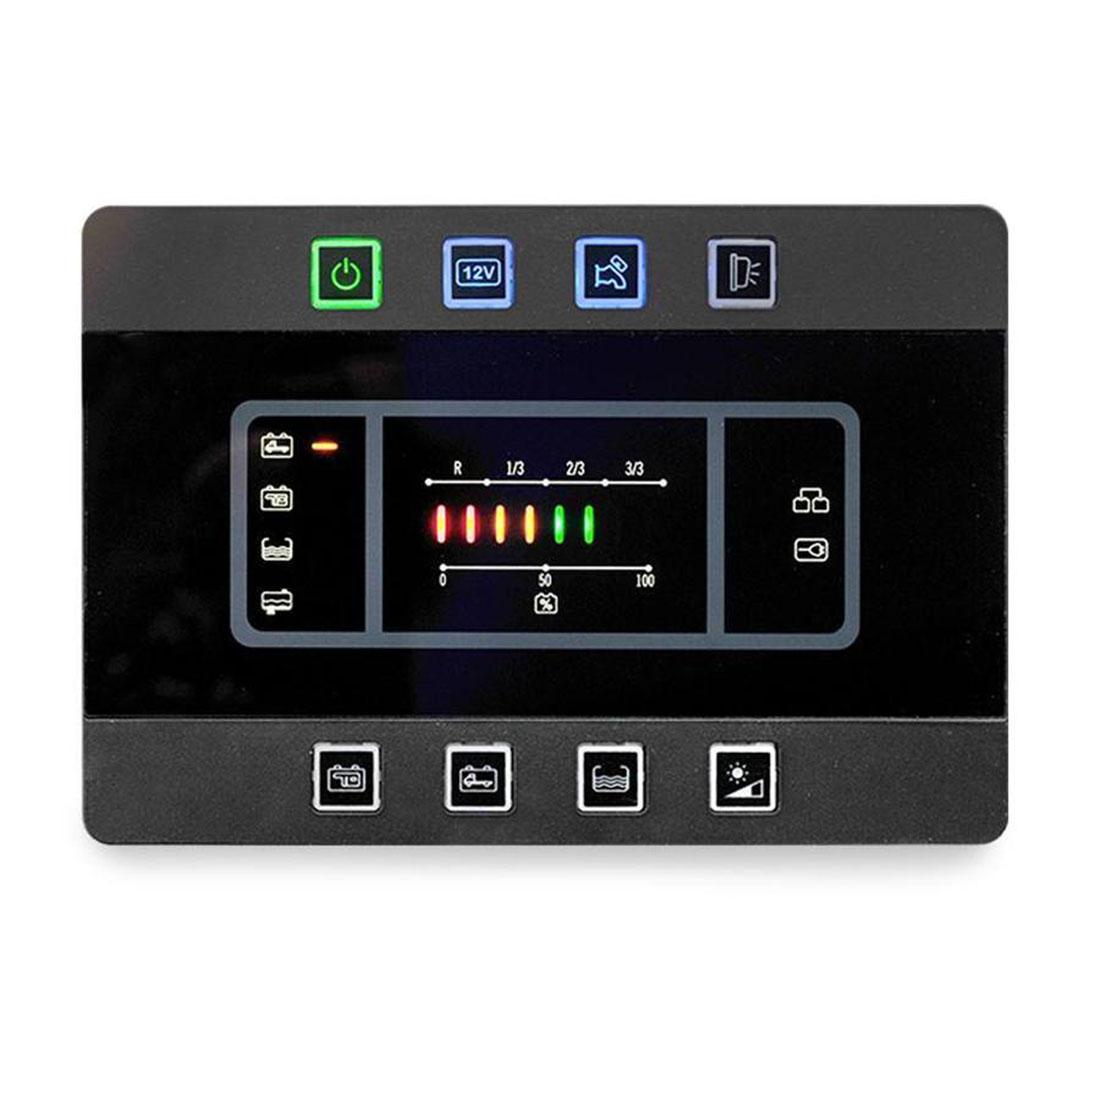 PC180 camper conversion power management system panel.